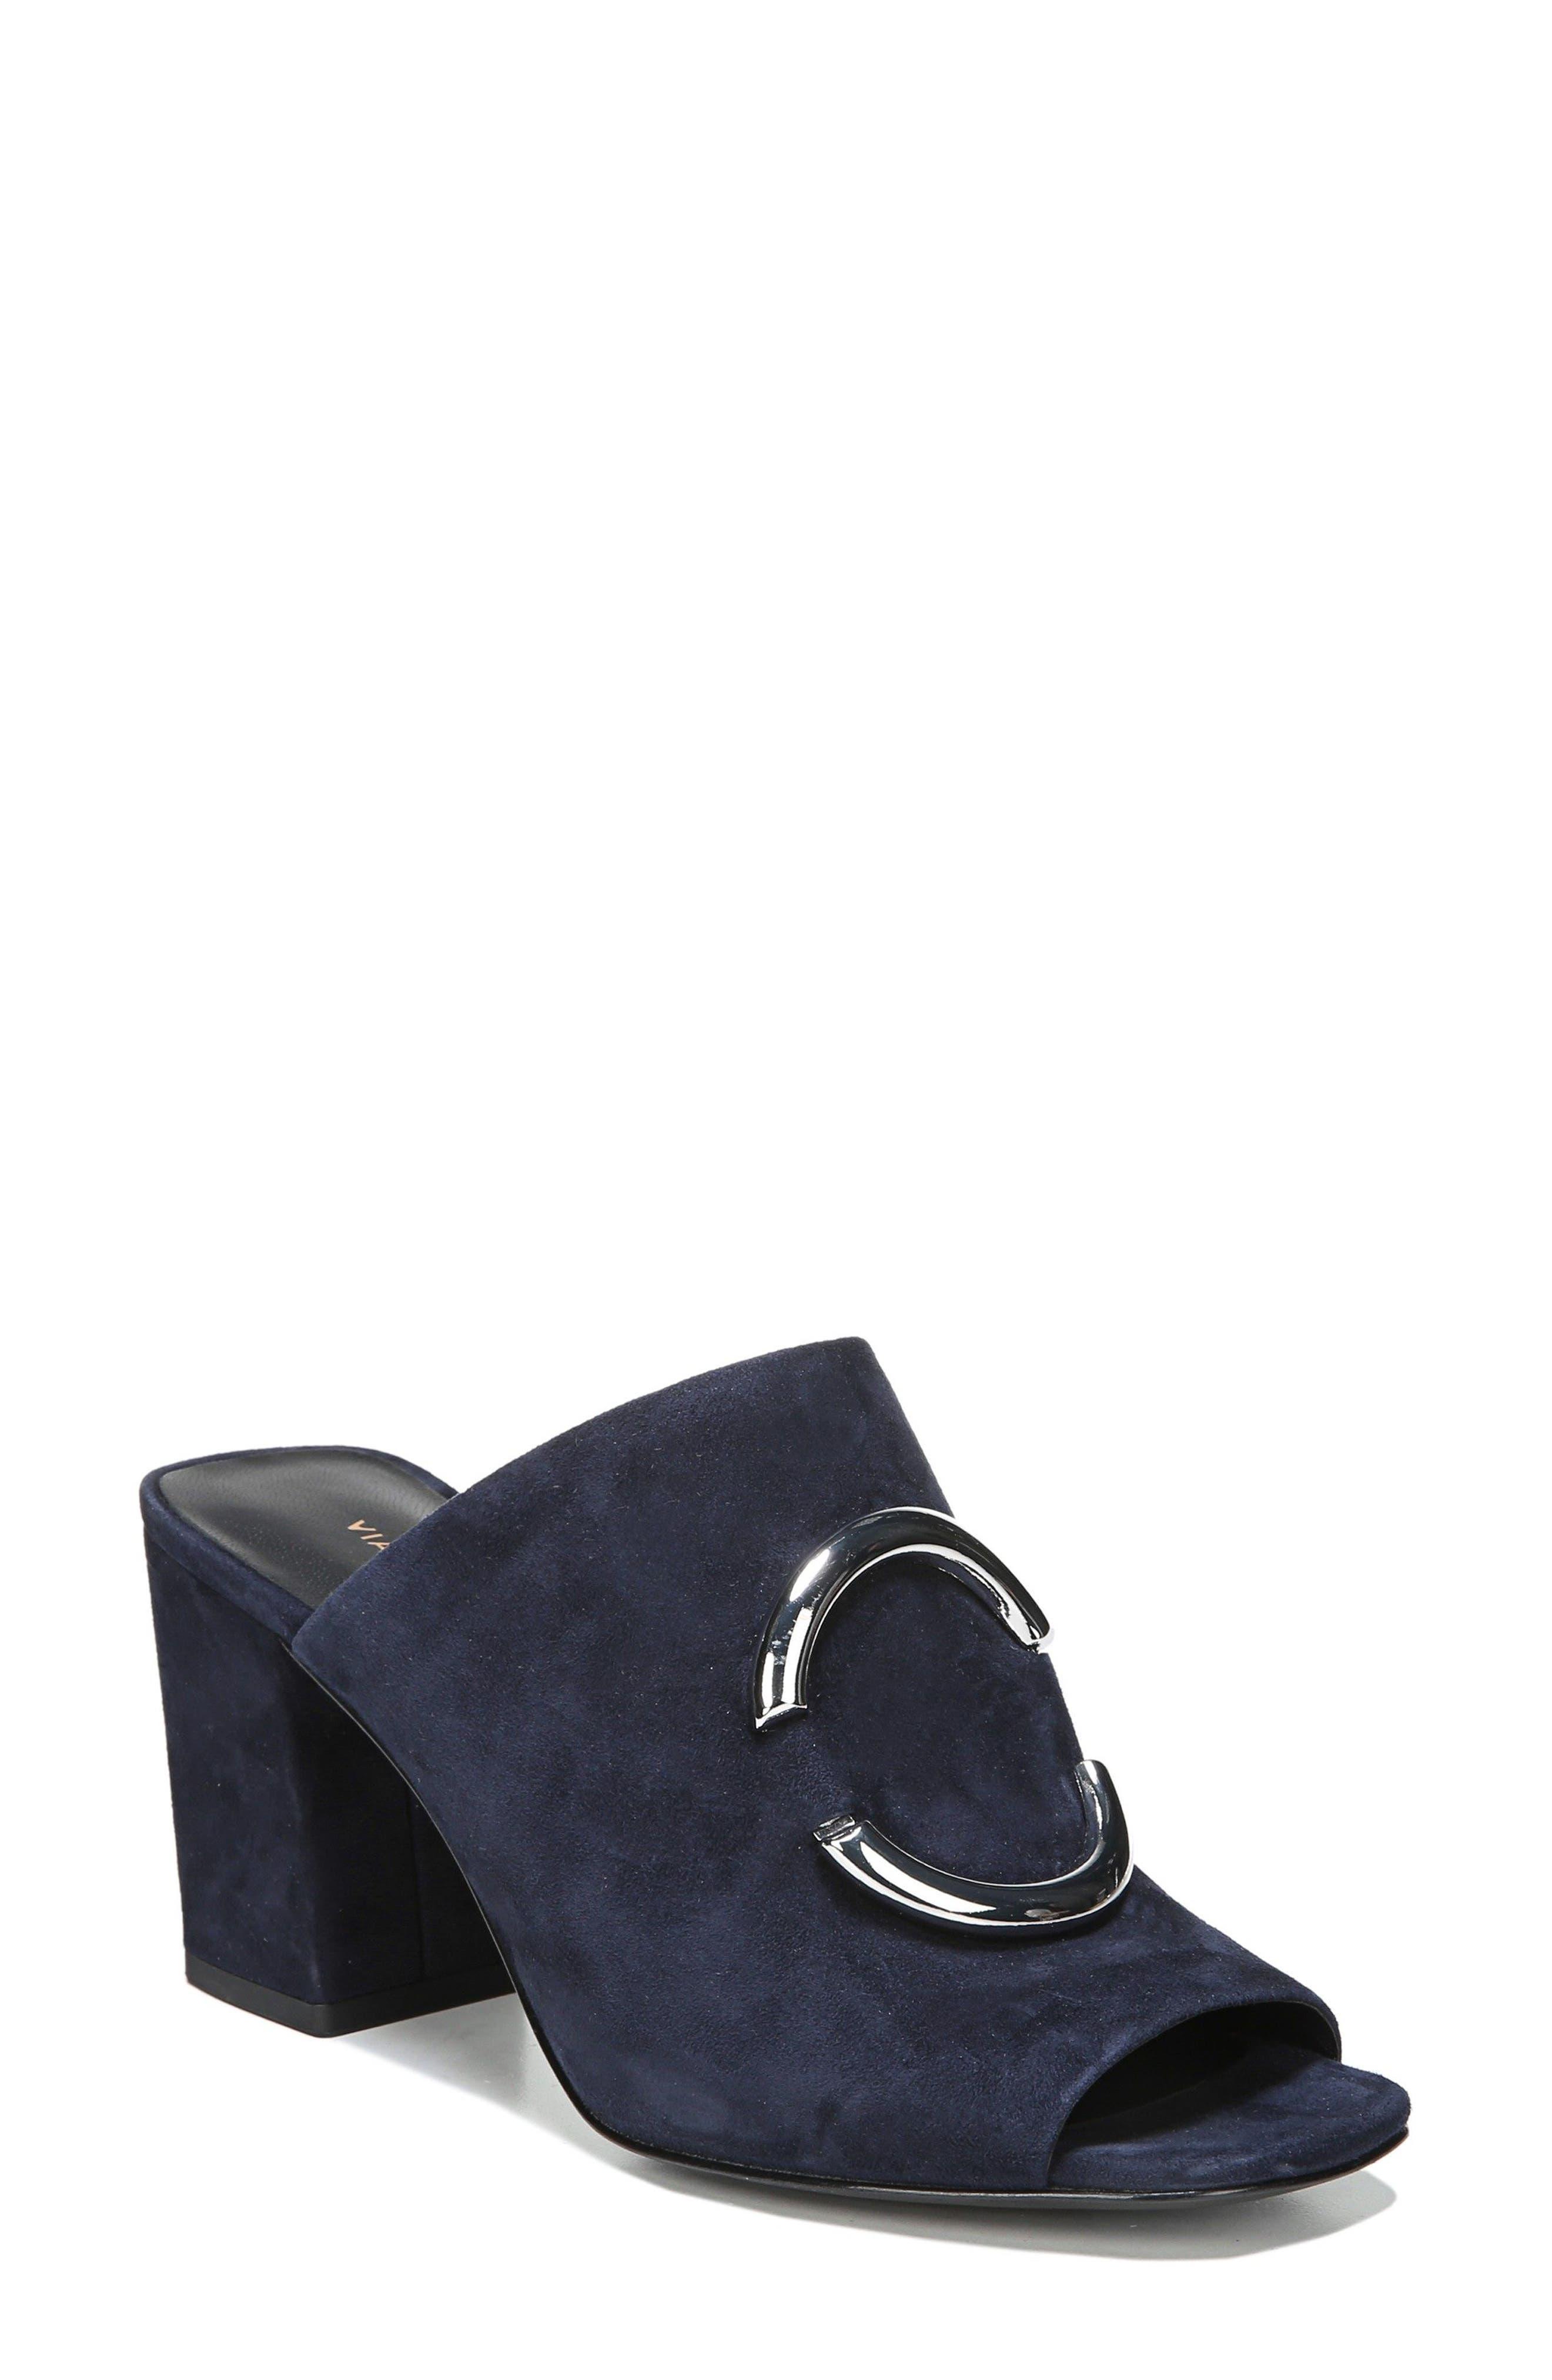 Eleni Slide Sandal,                         Main,                         color, Midnight Leather